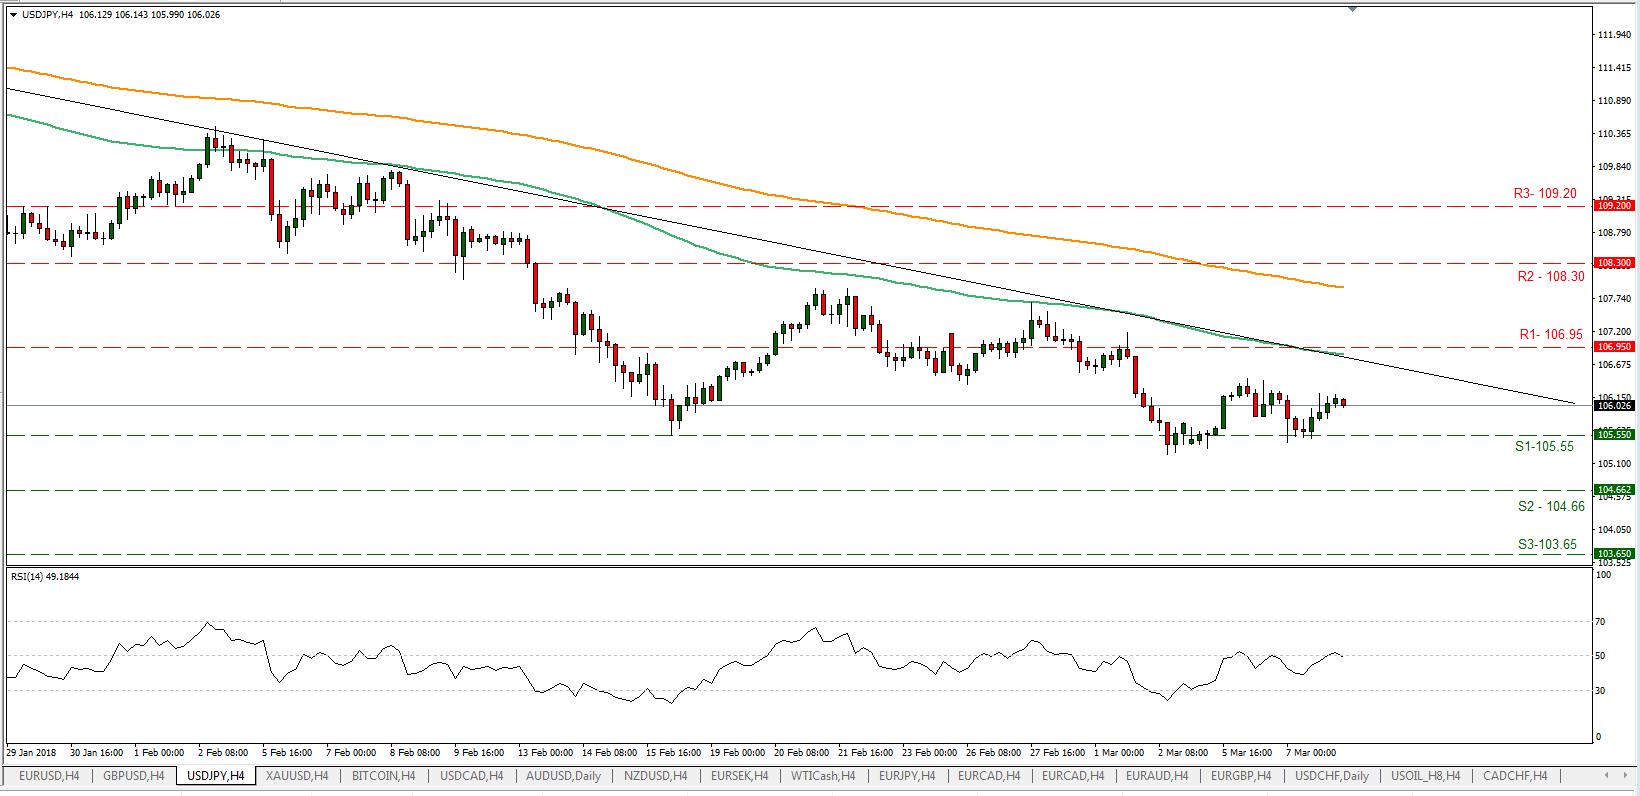 USD/JPY 08/03/2018 | EconAlerts